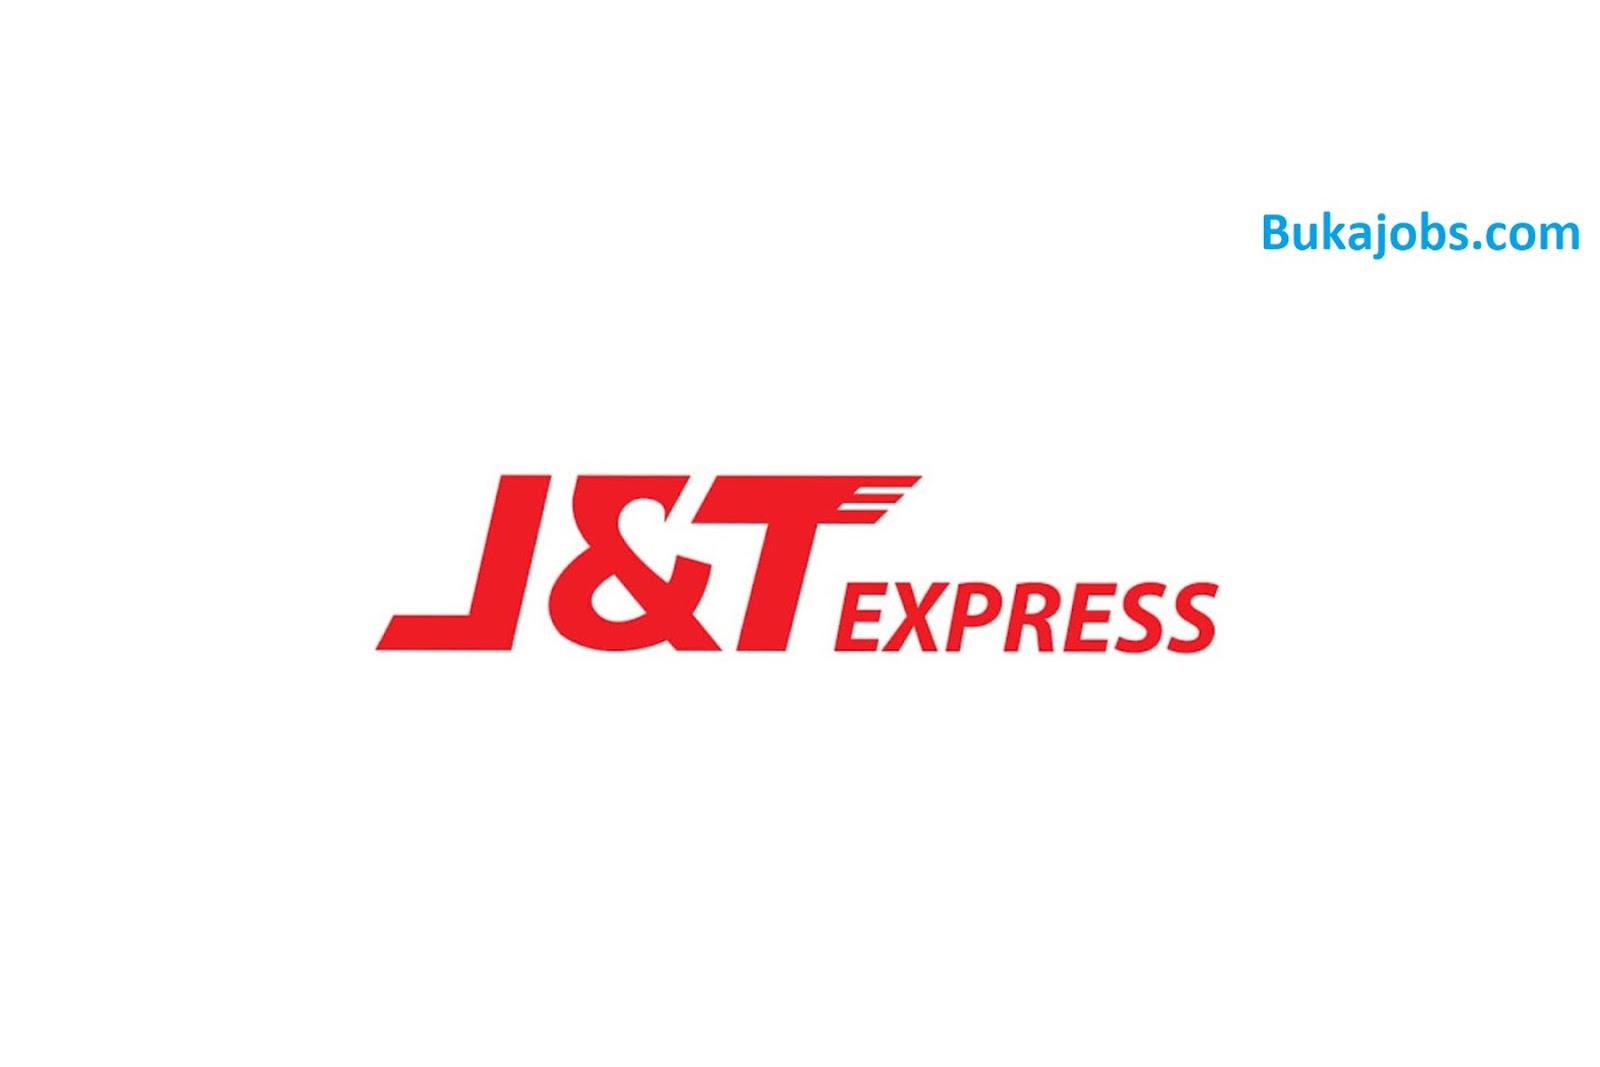 Lowongan Kerja J&T Express Terbaru 2019